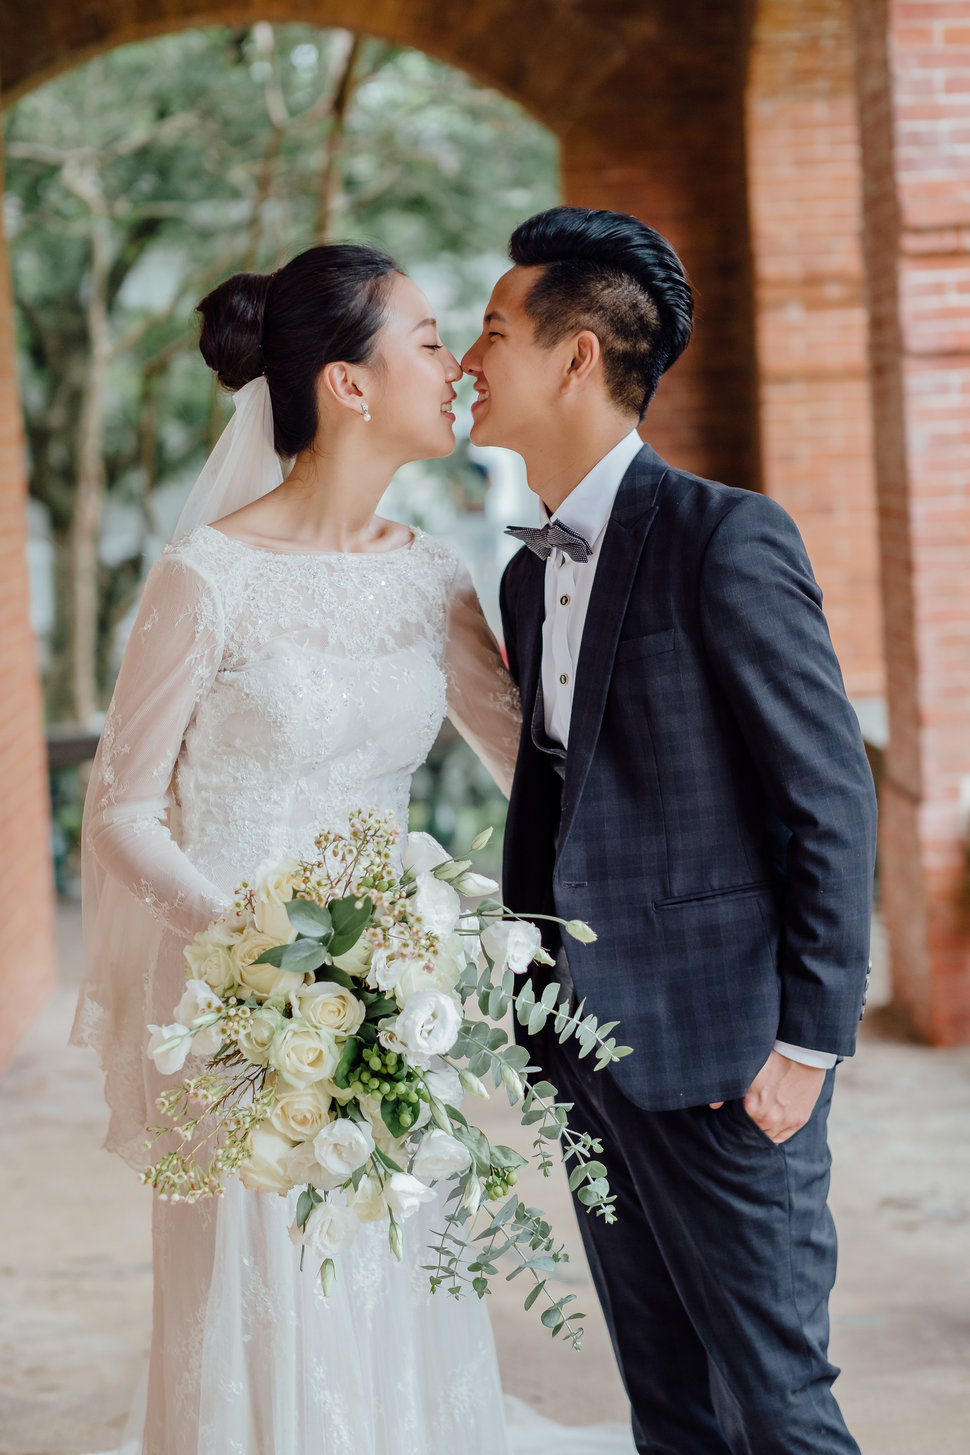 2017-07-22-15h13m18-DSCF5384 - Vicky Li 新娘秘書《結婚吧》